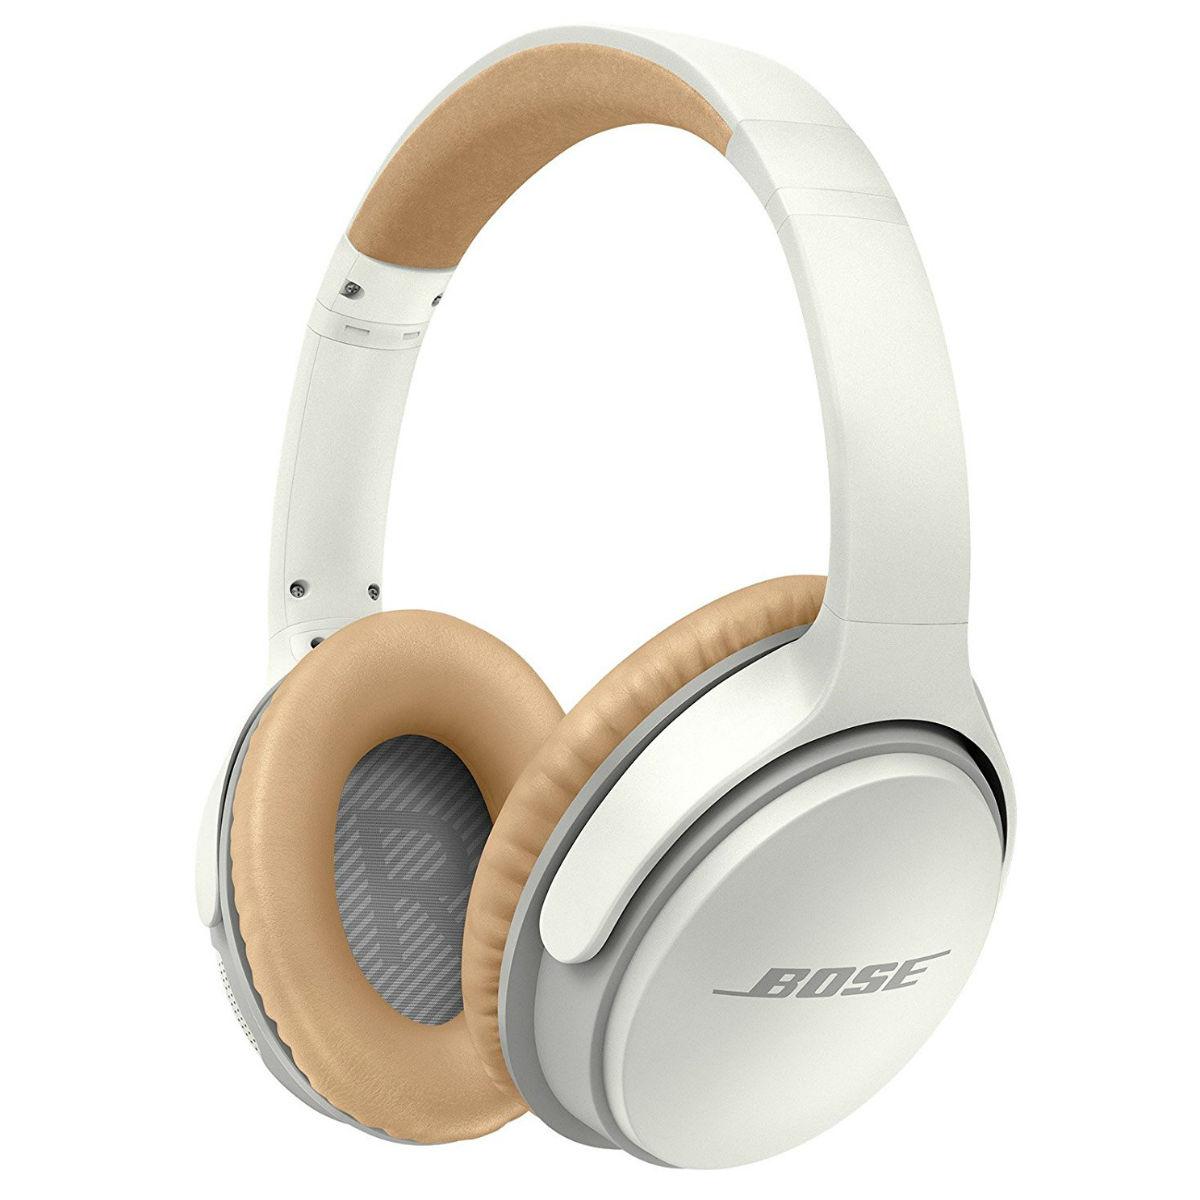 Soundlink around-ear wireless headphones, £199.95, Bose